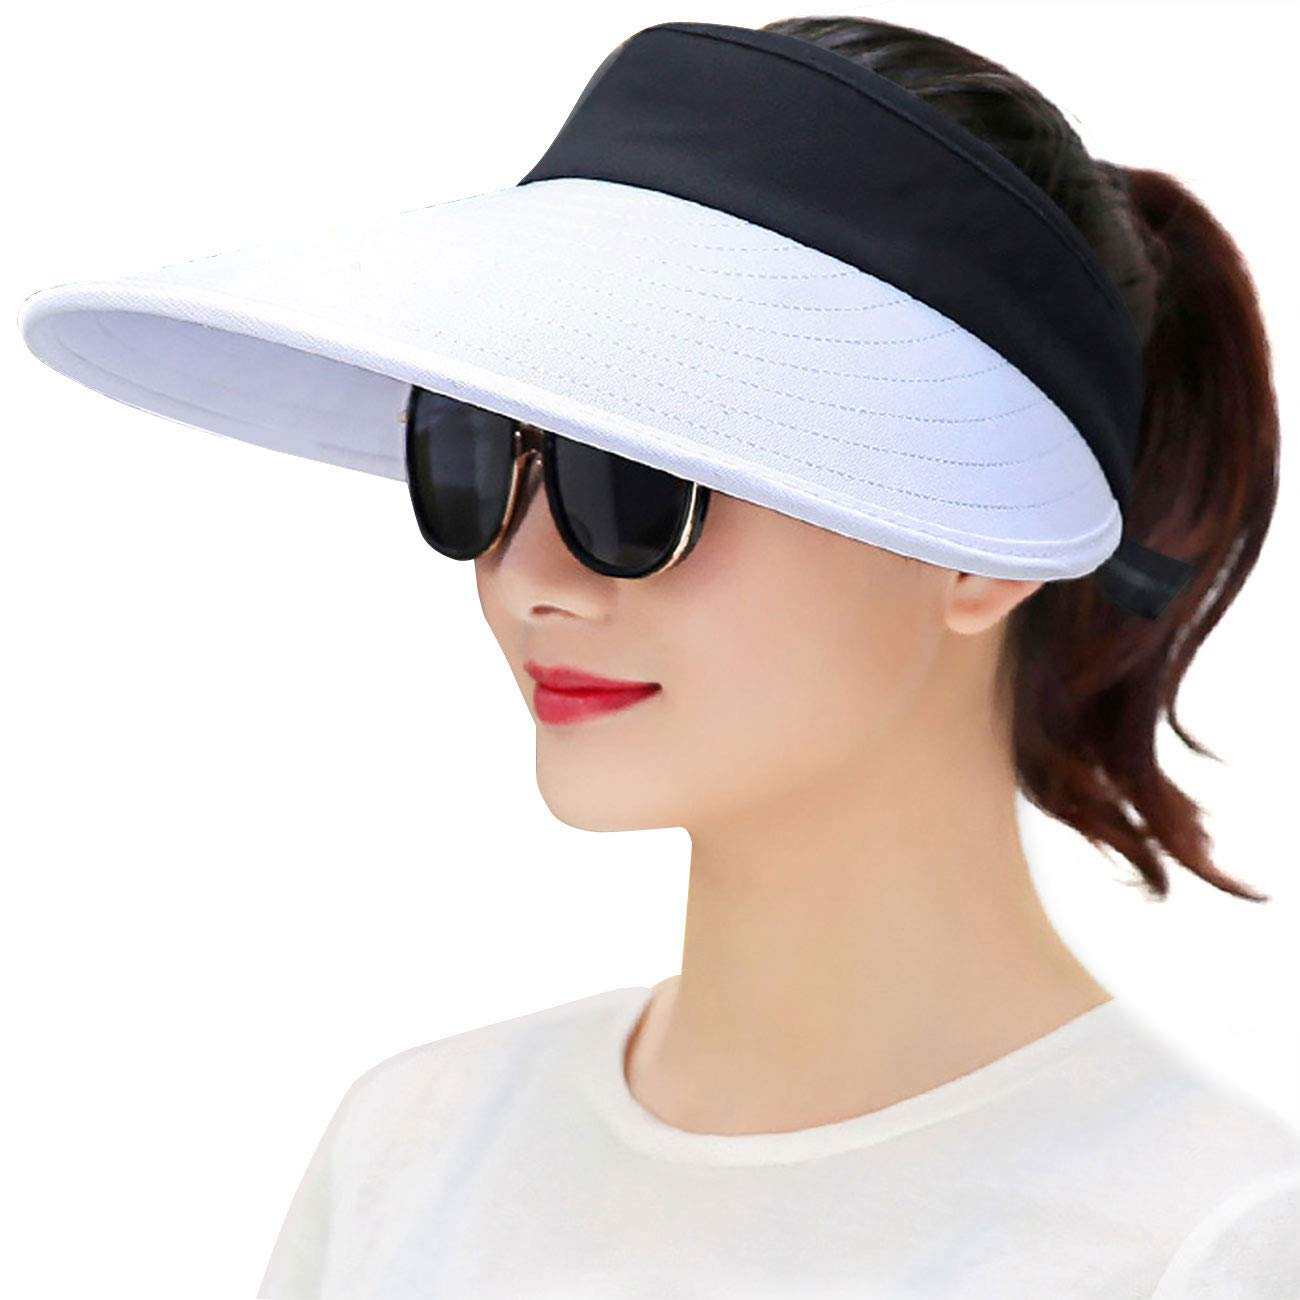 Maylisacc Wide Brim Sun Visors for Women Packable Sun Hat Beach Golf Gardening Topless-Hat